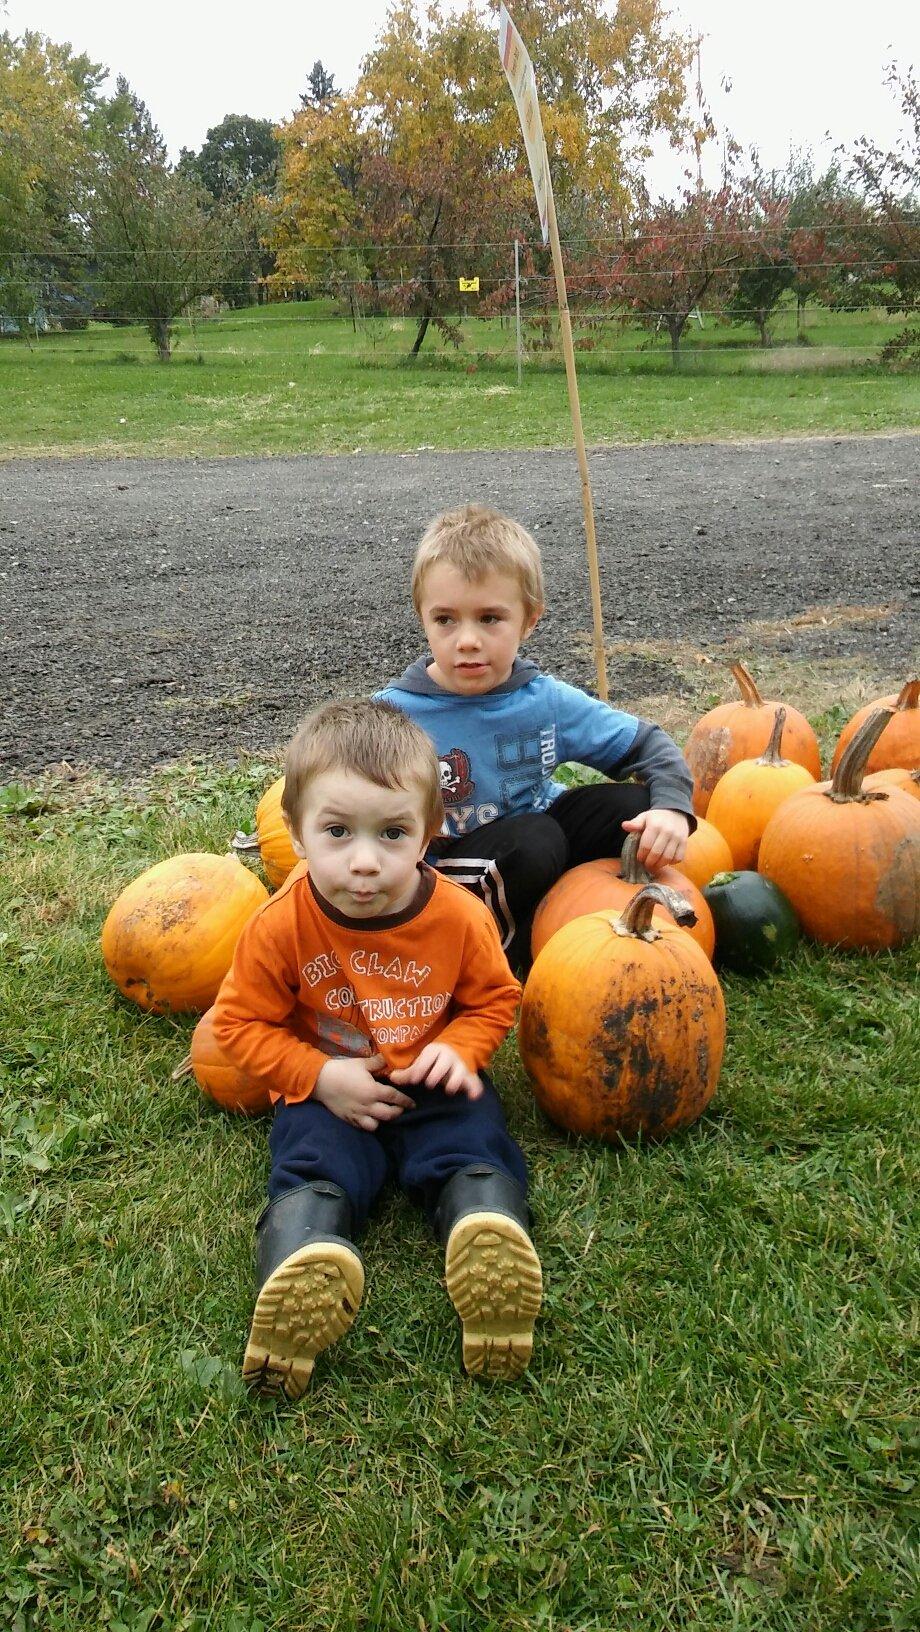 field trip for pre-schooler to pumpkin patch